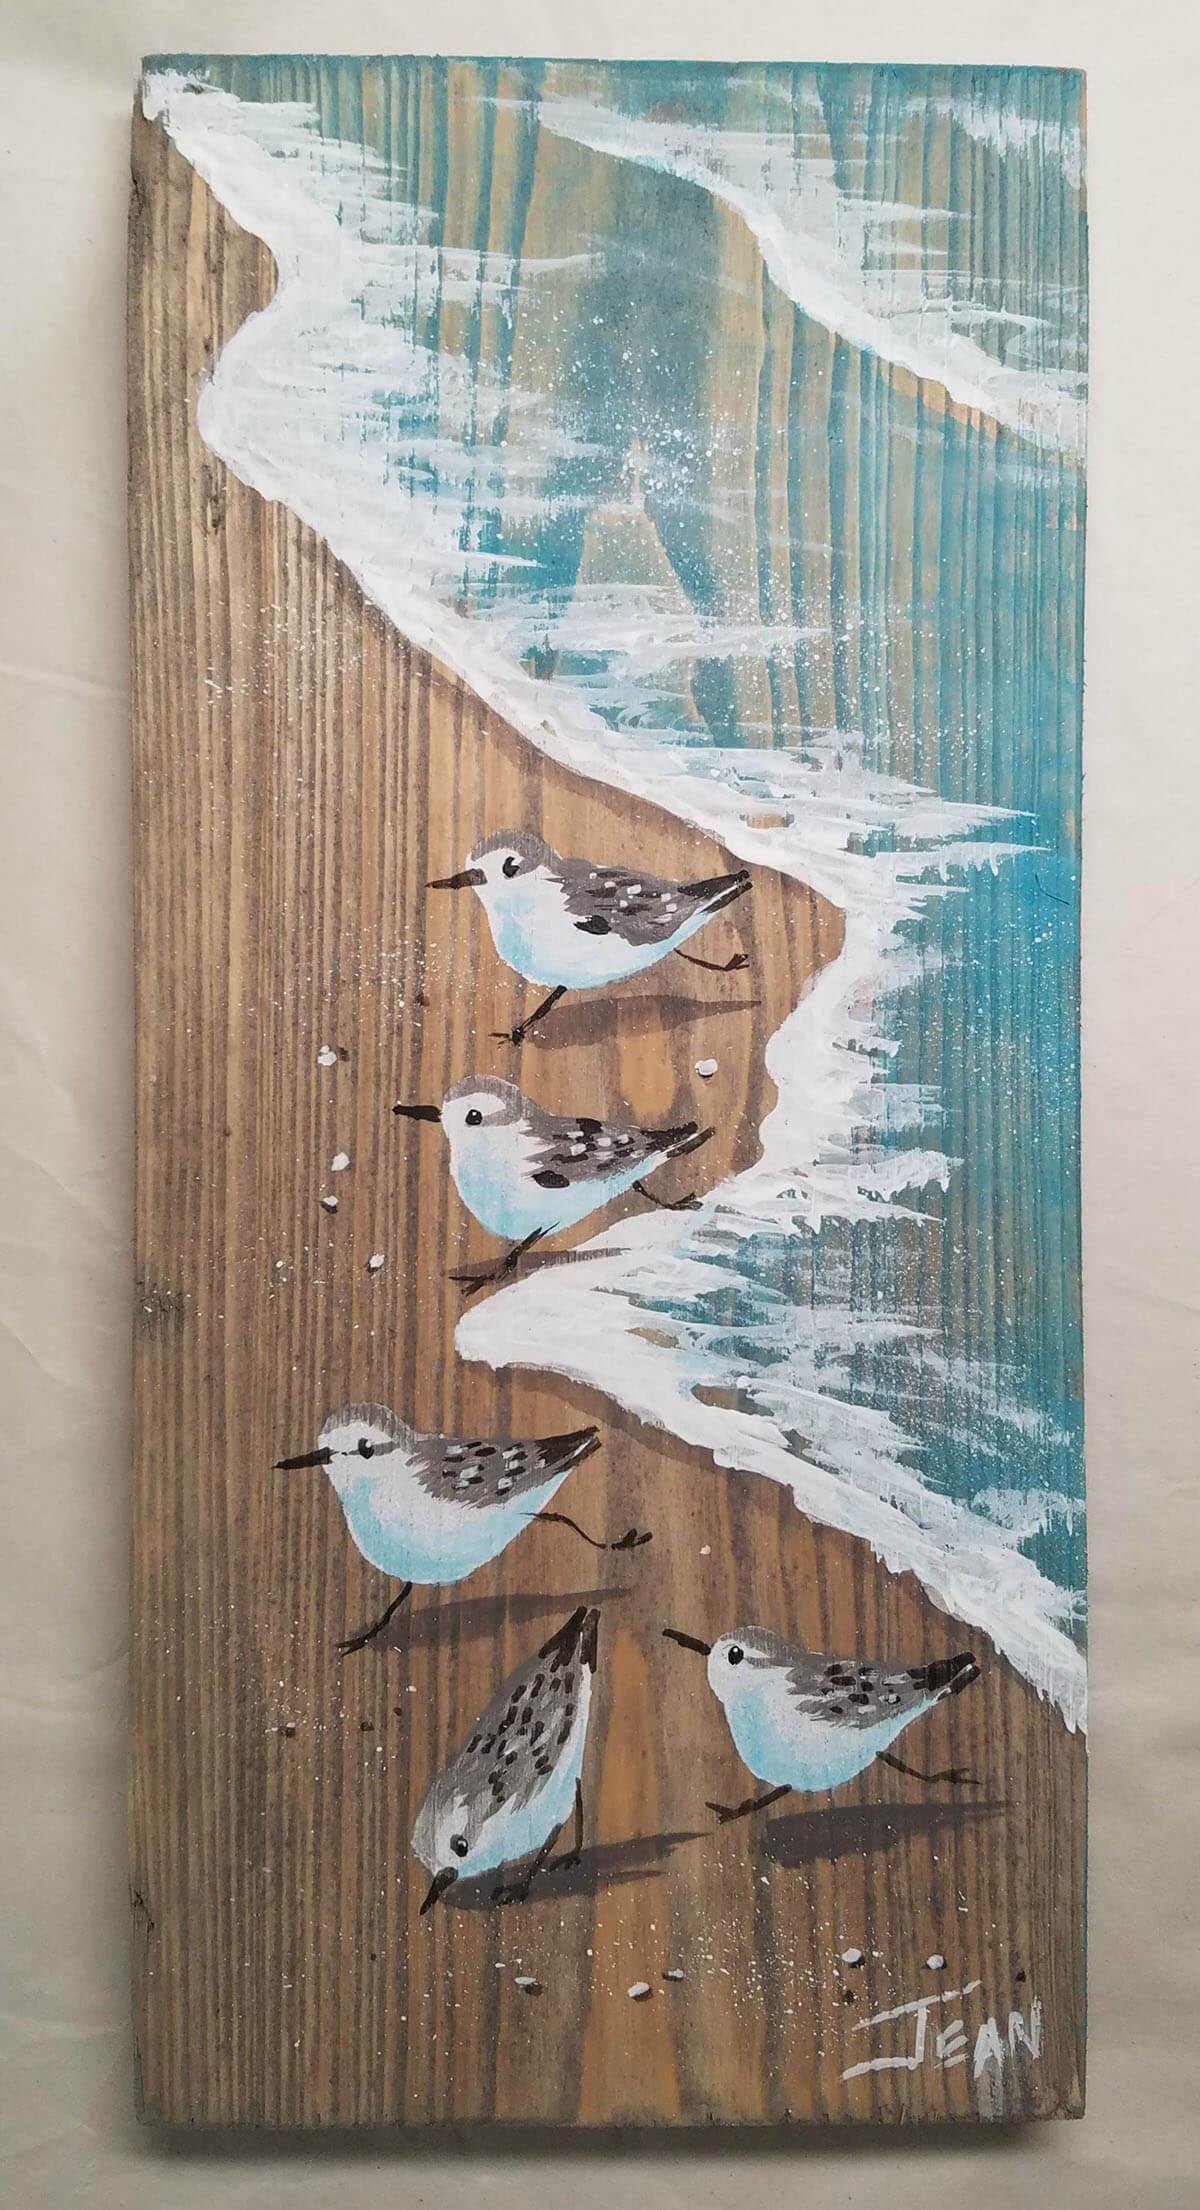 Seaside Seagulls Wooden Art Piece